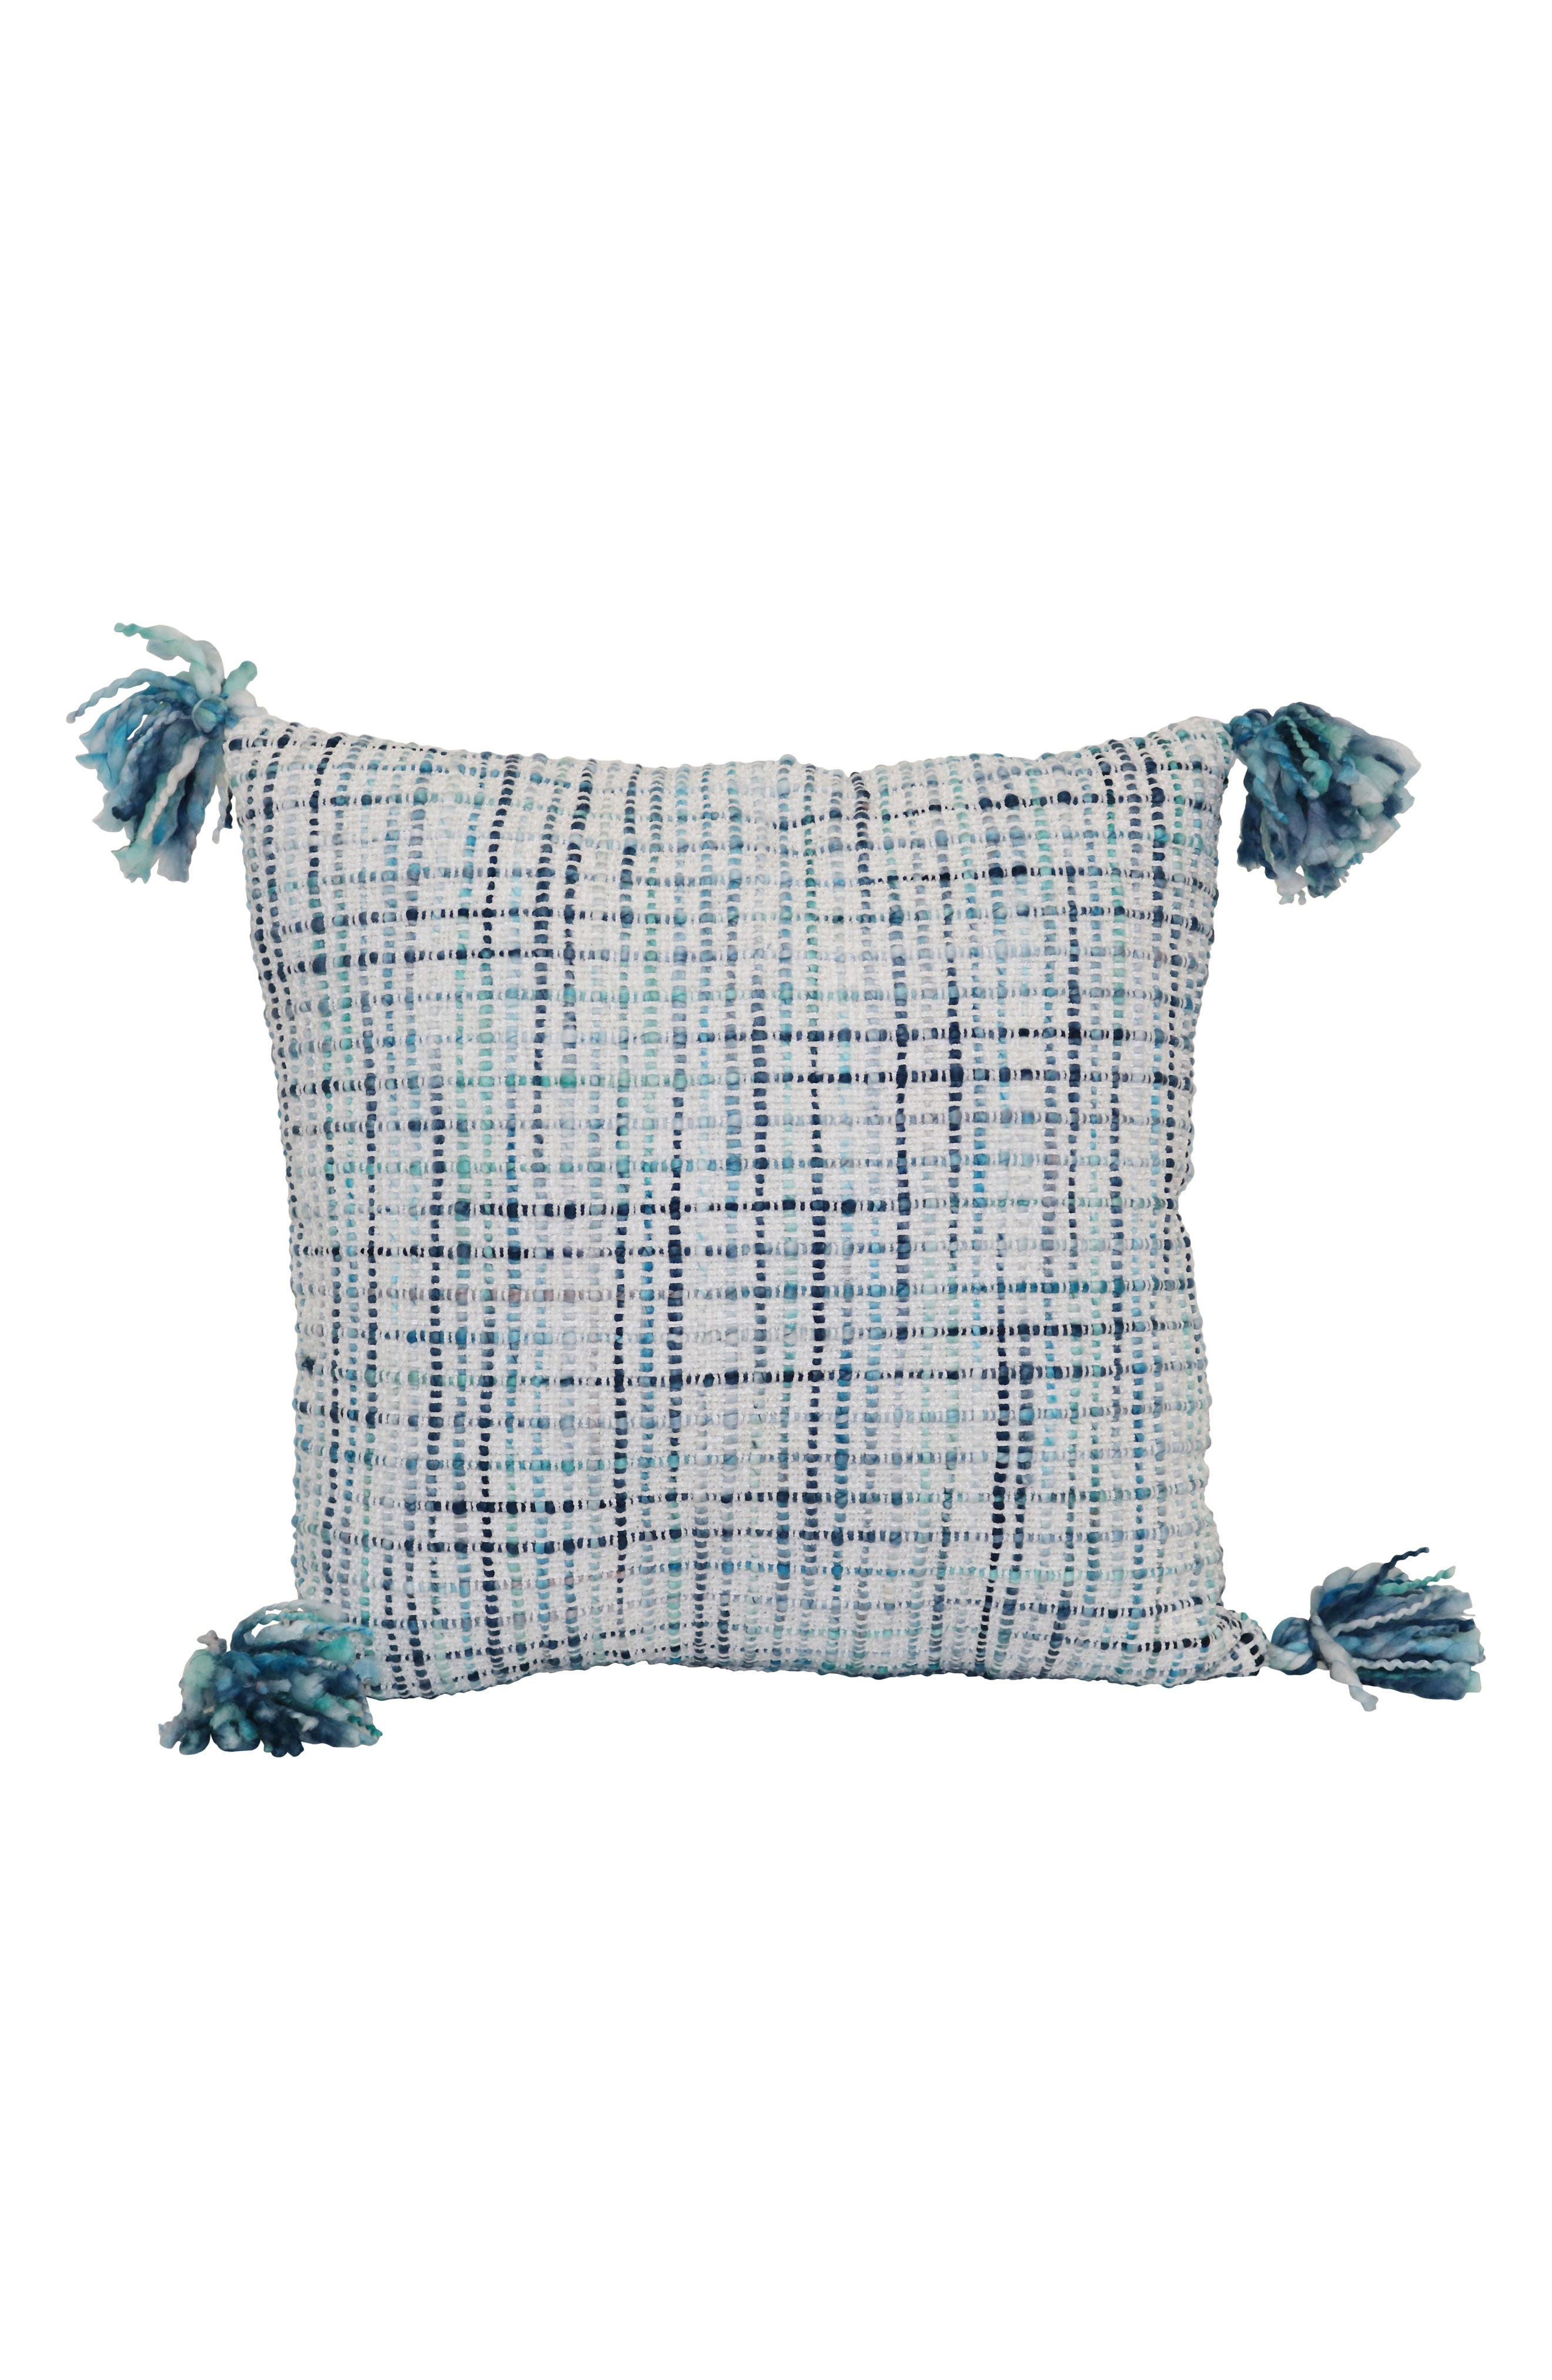 Alternate Image 1 Selected - Brentwood Originals Tassel Accent Pillow